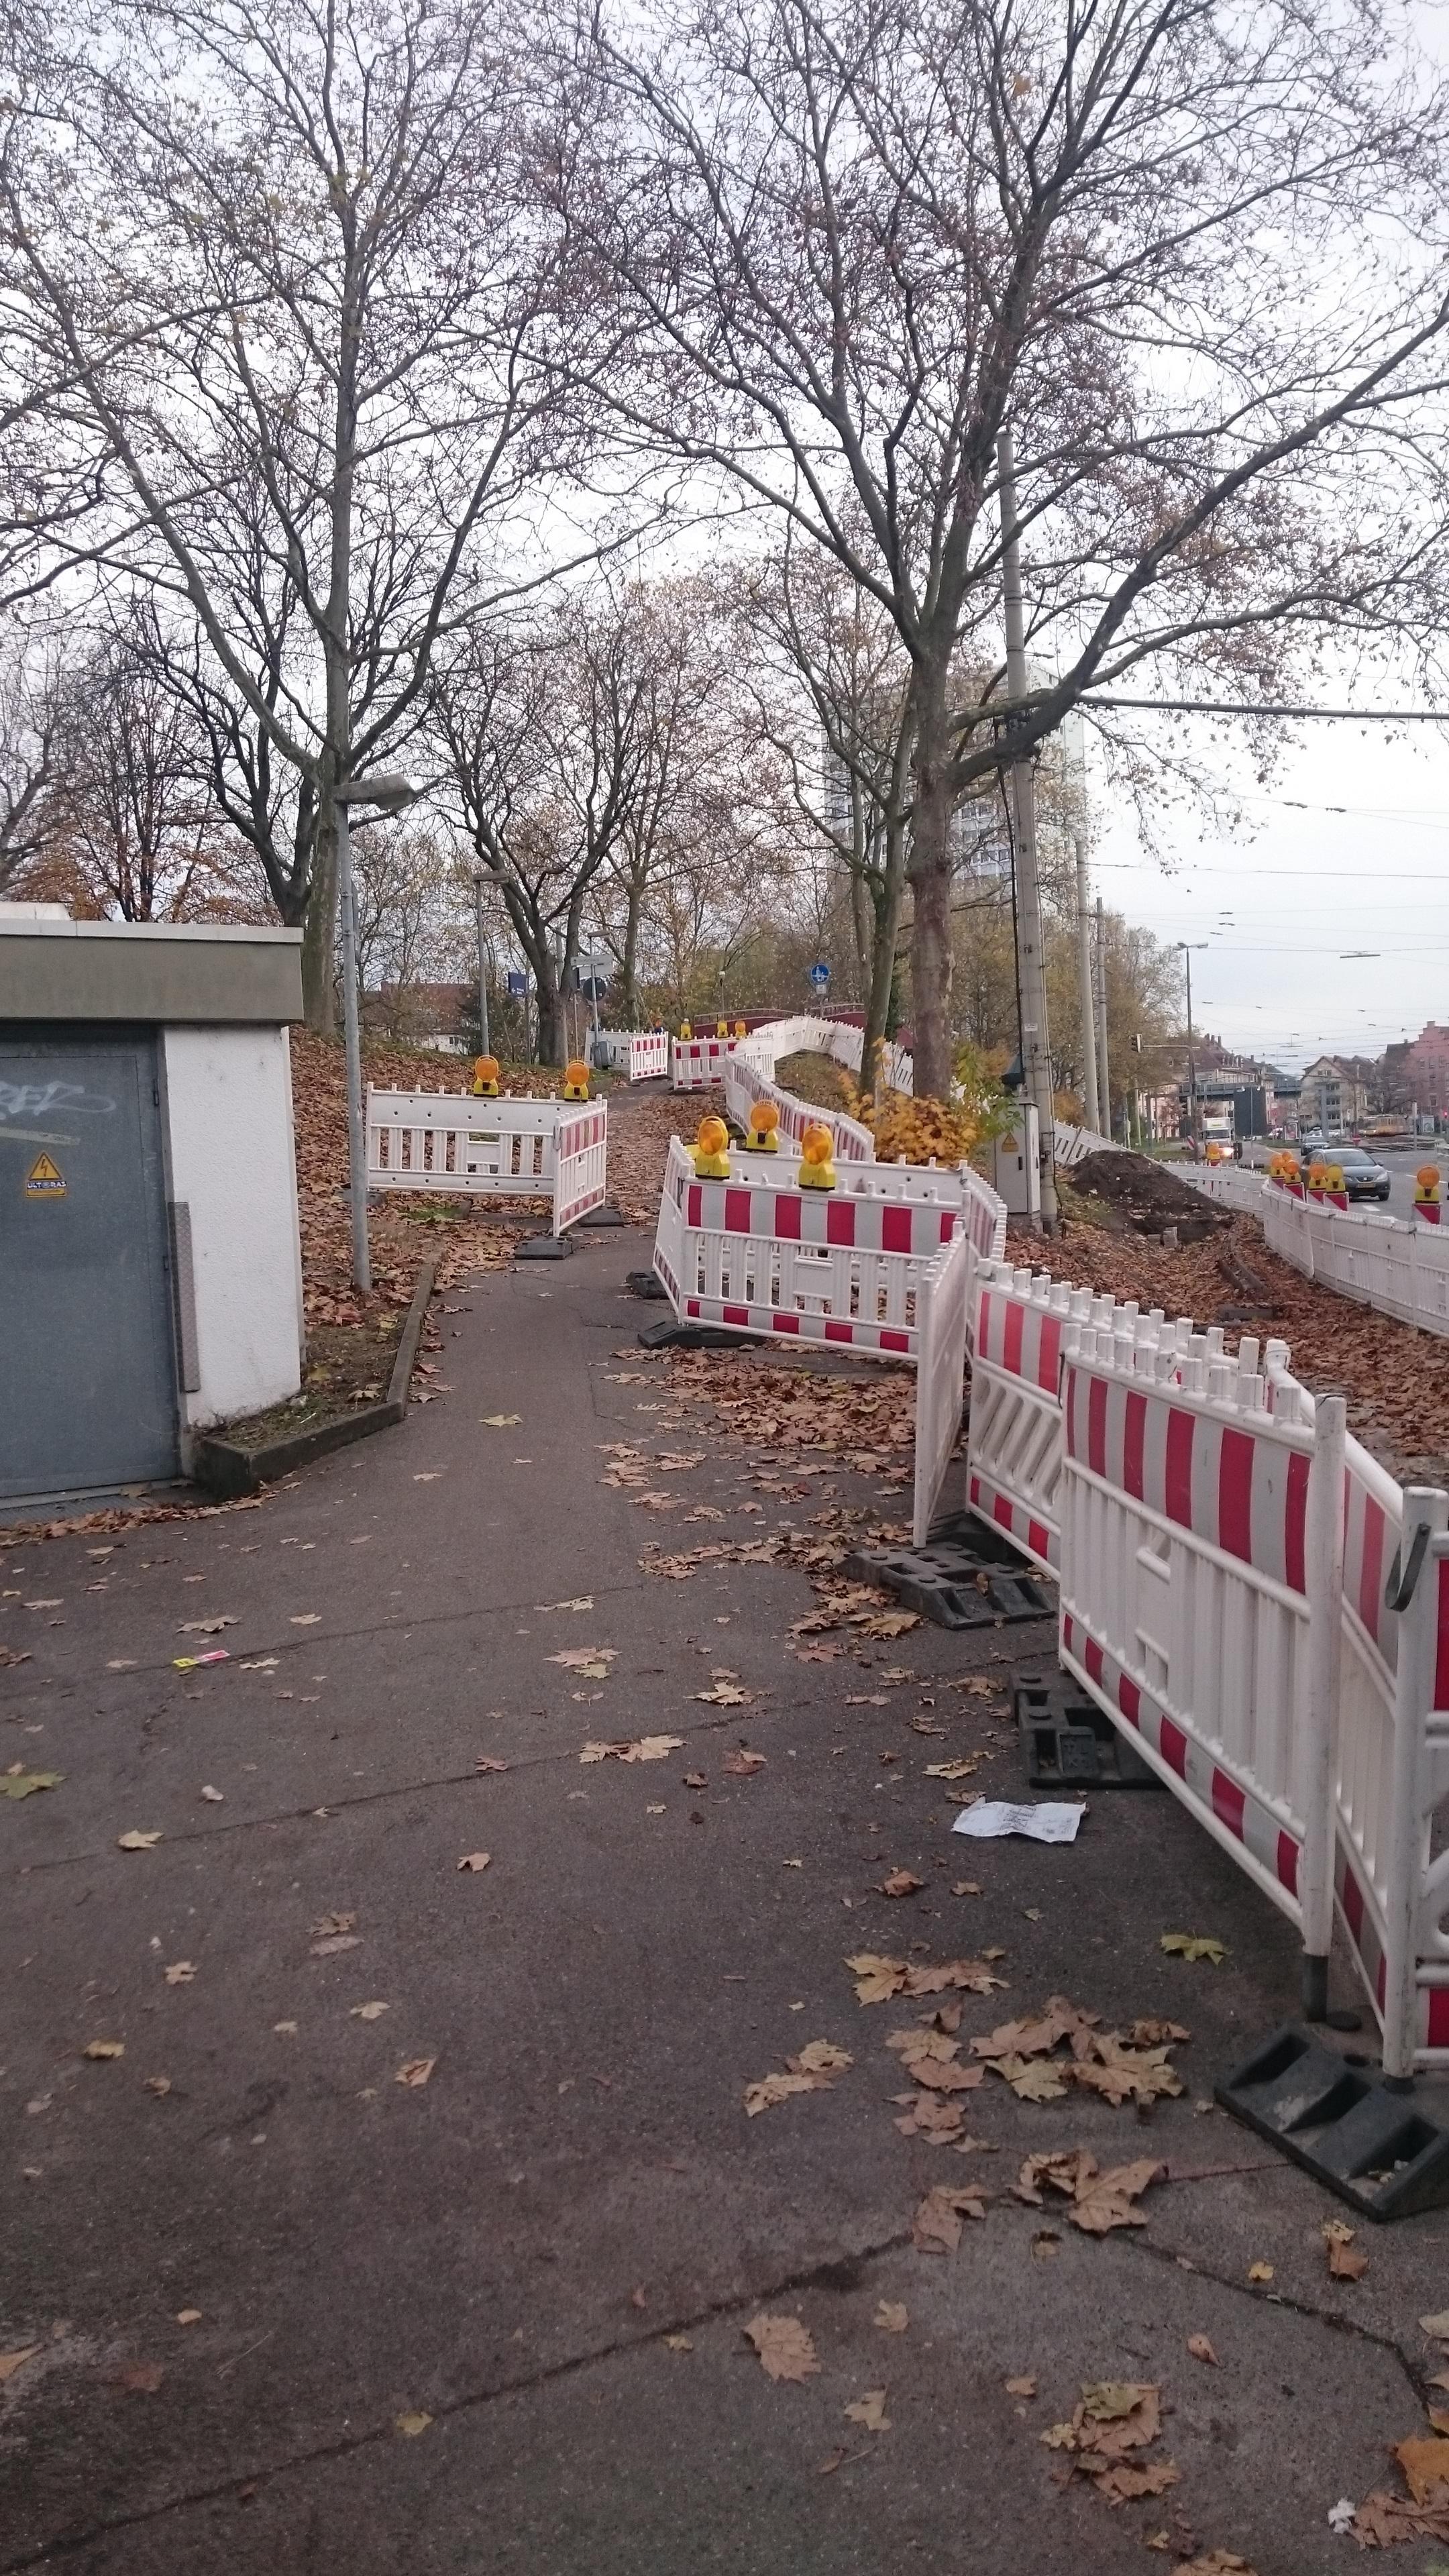 Mängel gemeldet: Baustelle versperrt den Gehweg